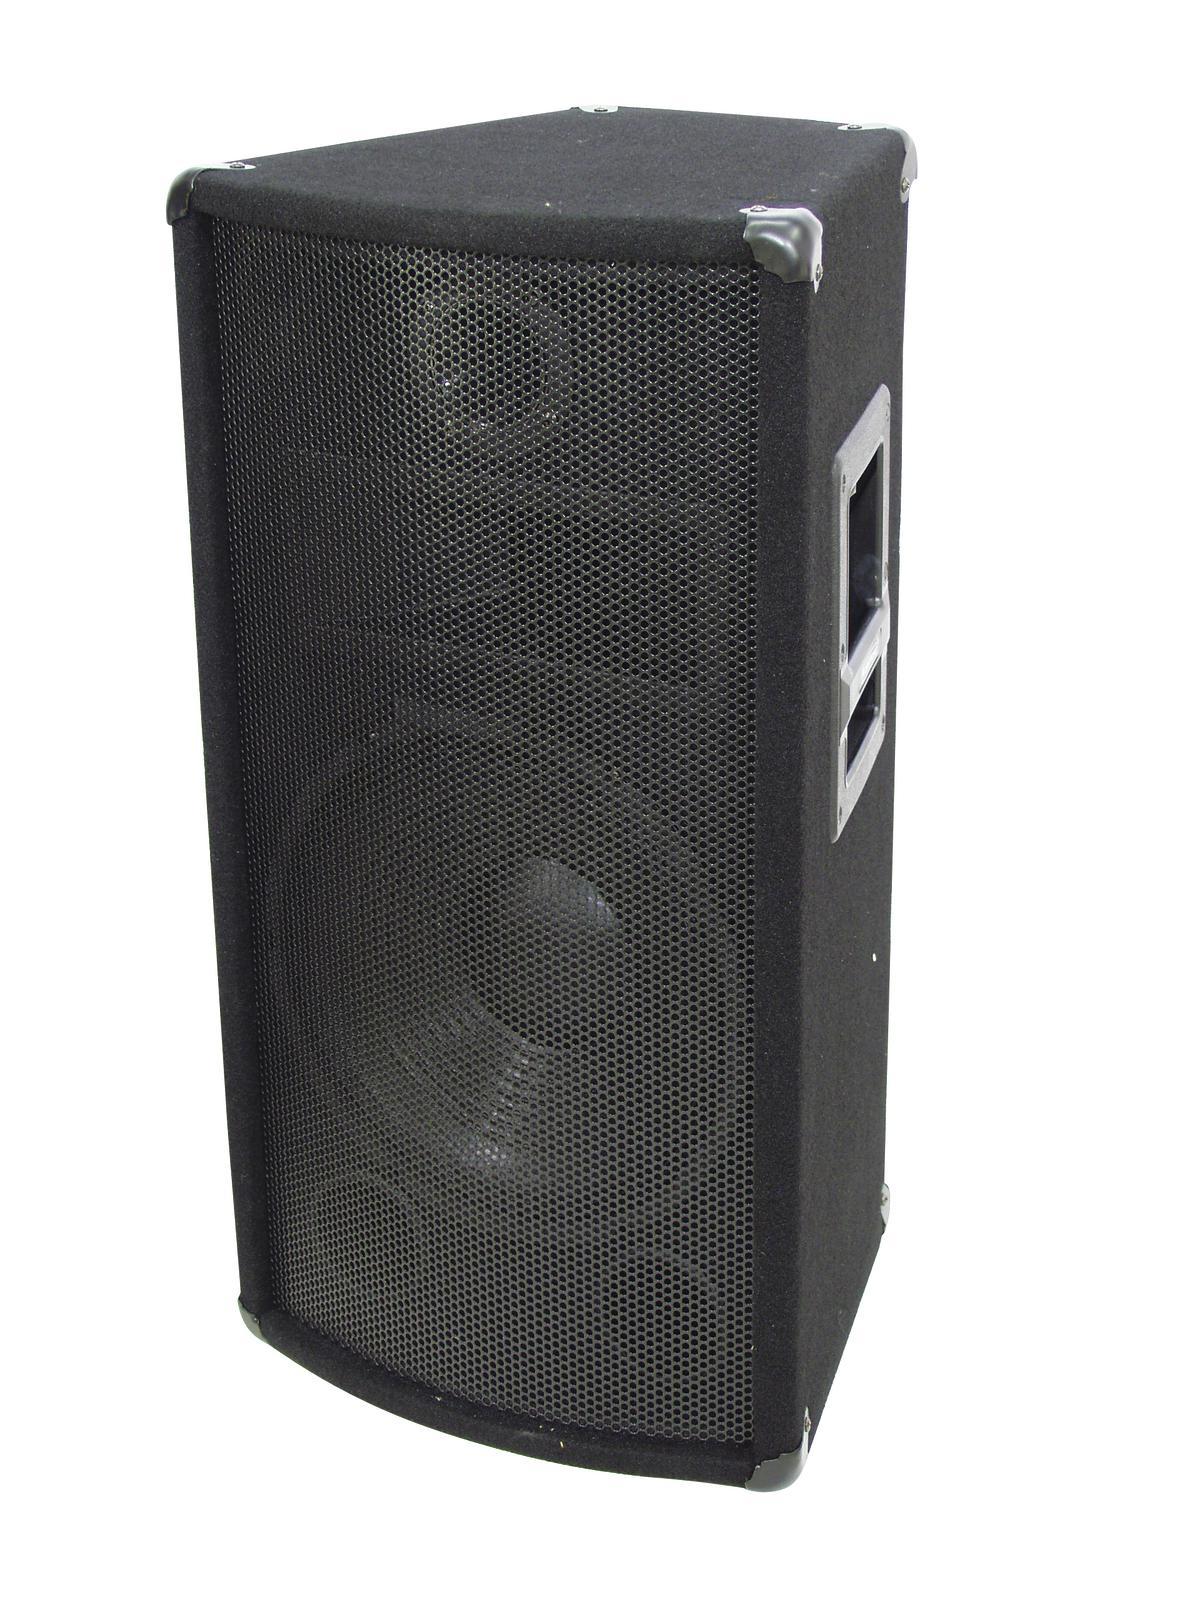 OMNITRONIC TX-1220 3-Wege-Box 700W